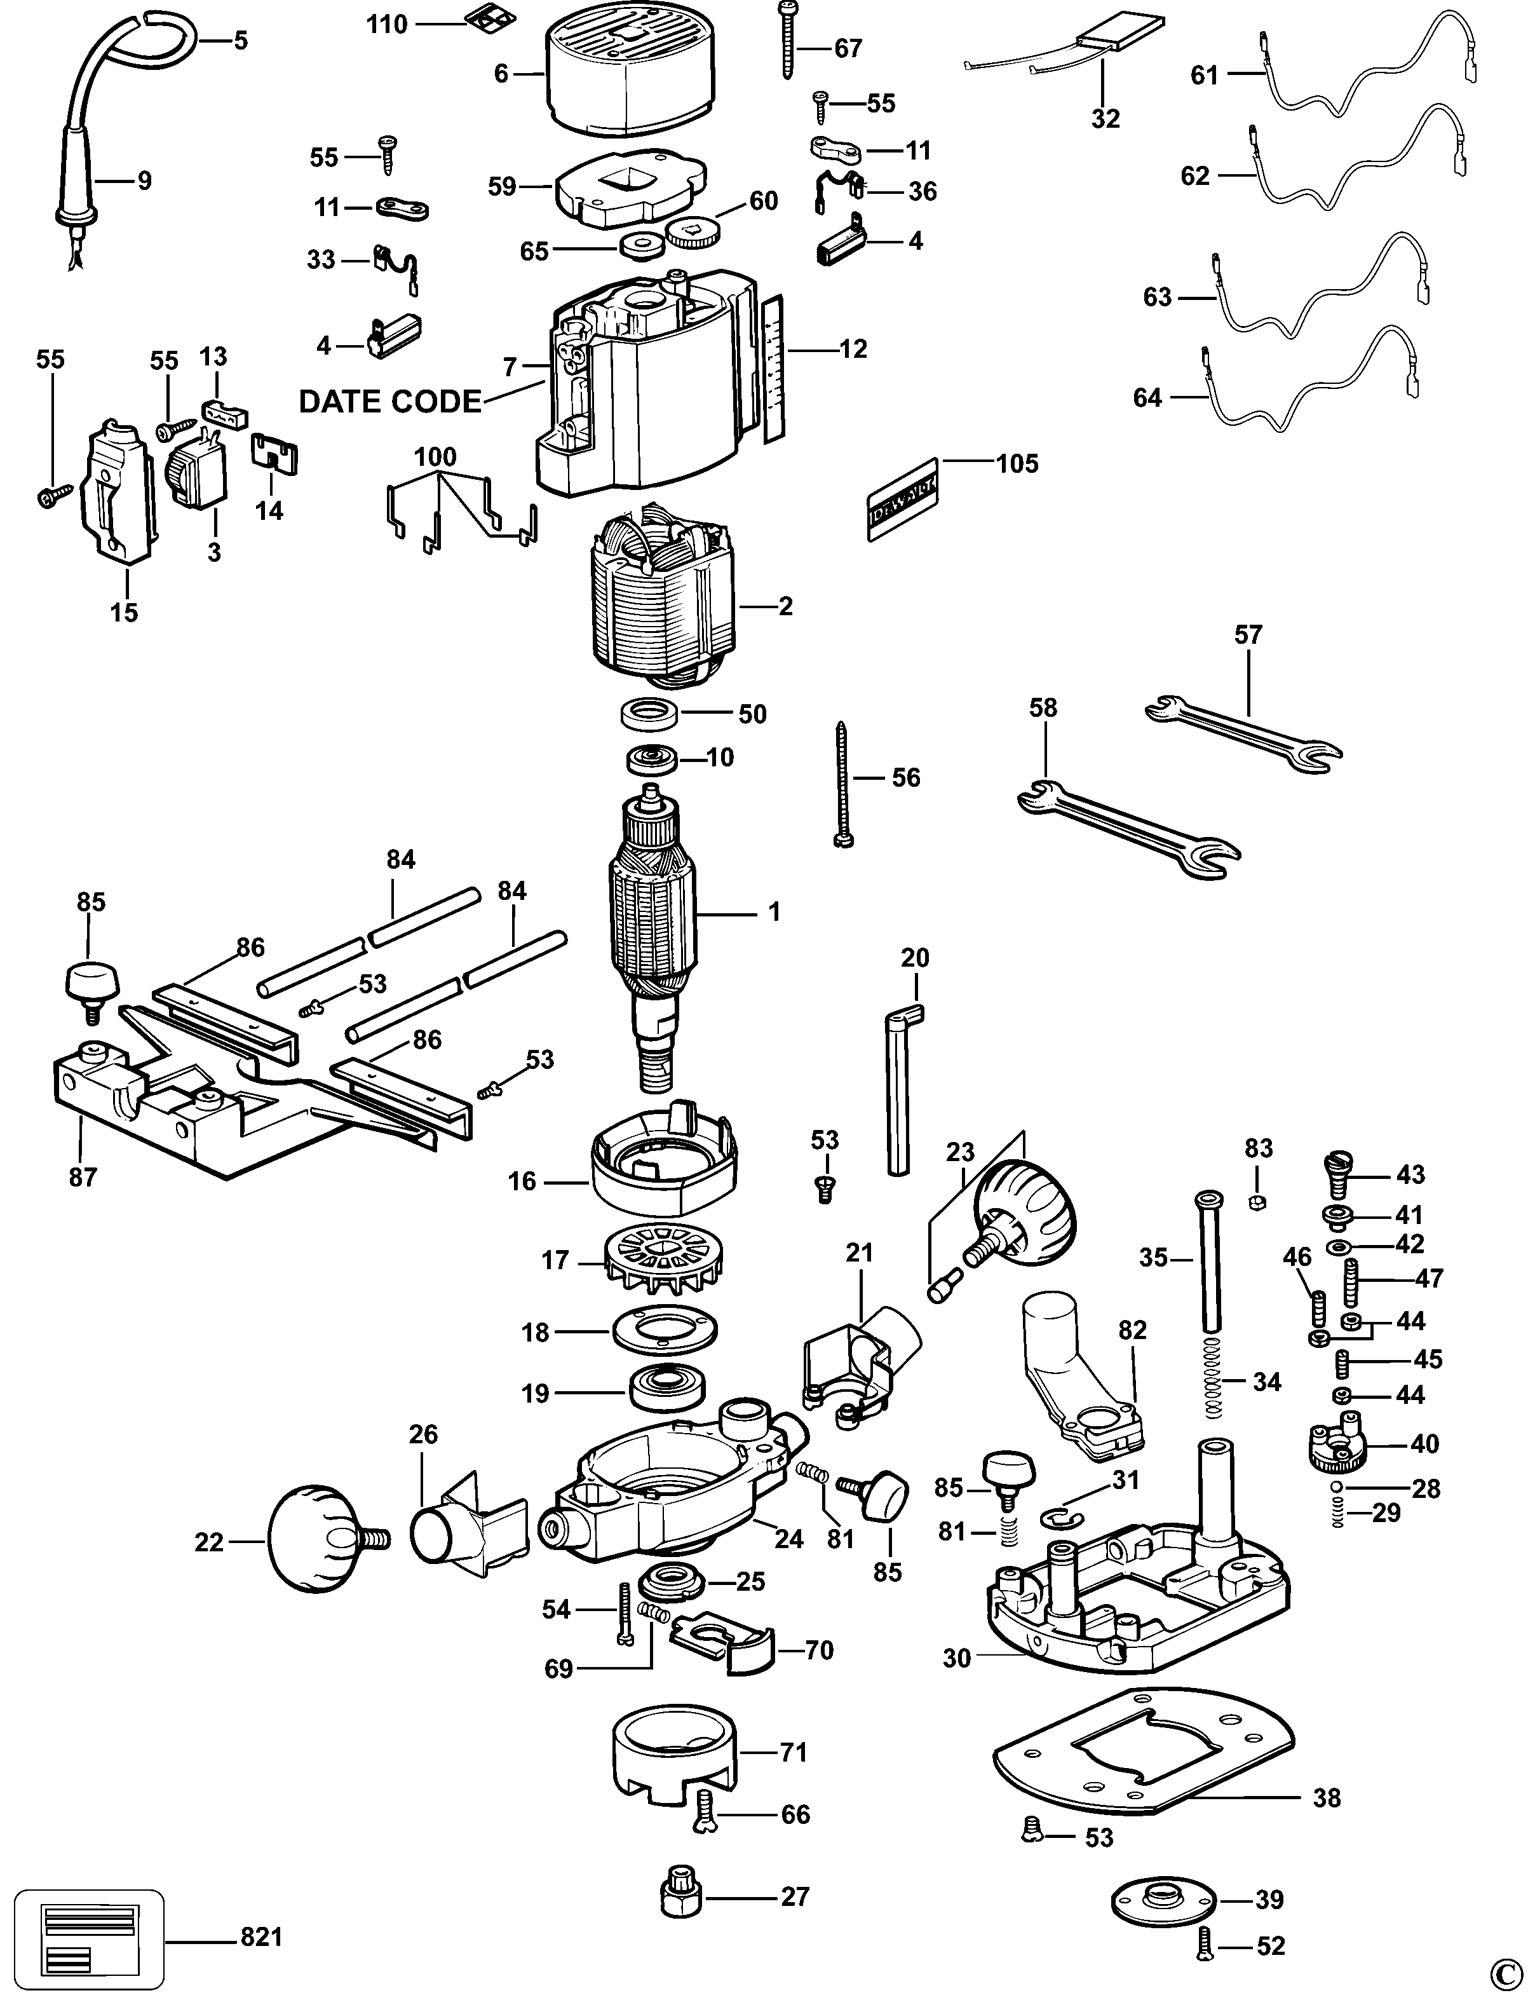 Spares For Dewalt Dw615 Router Type 5 Spare Dw615 Type 5